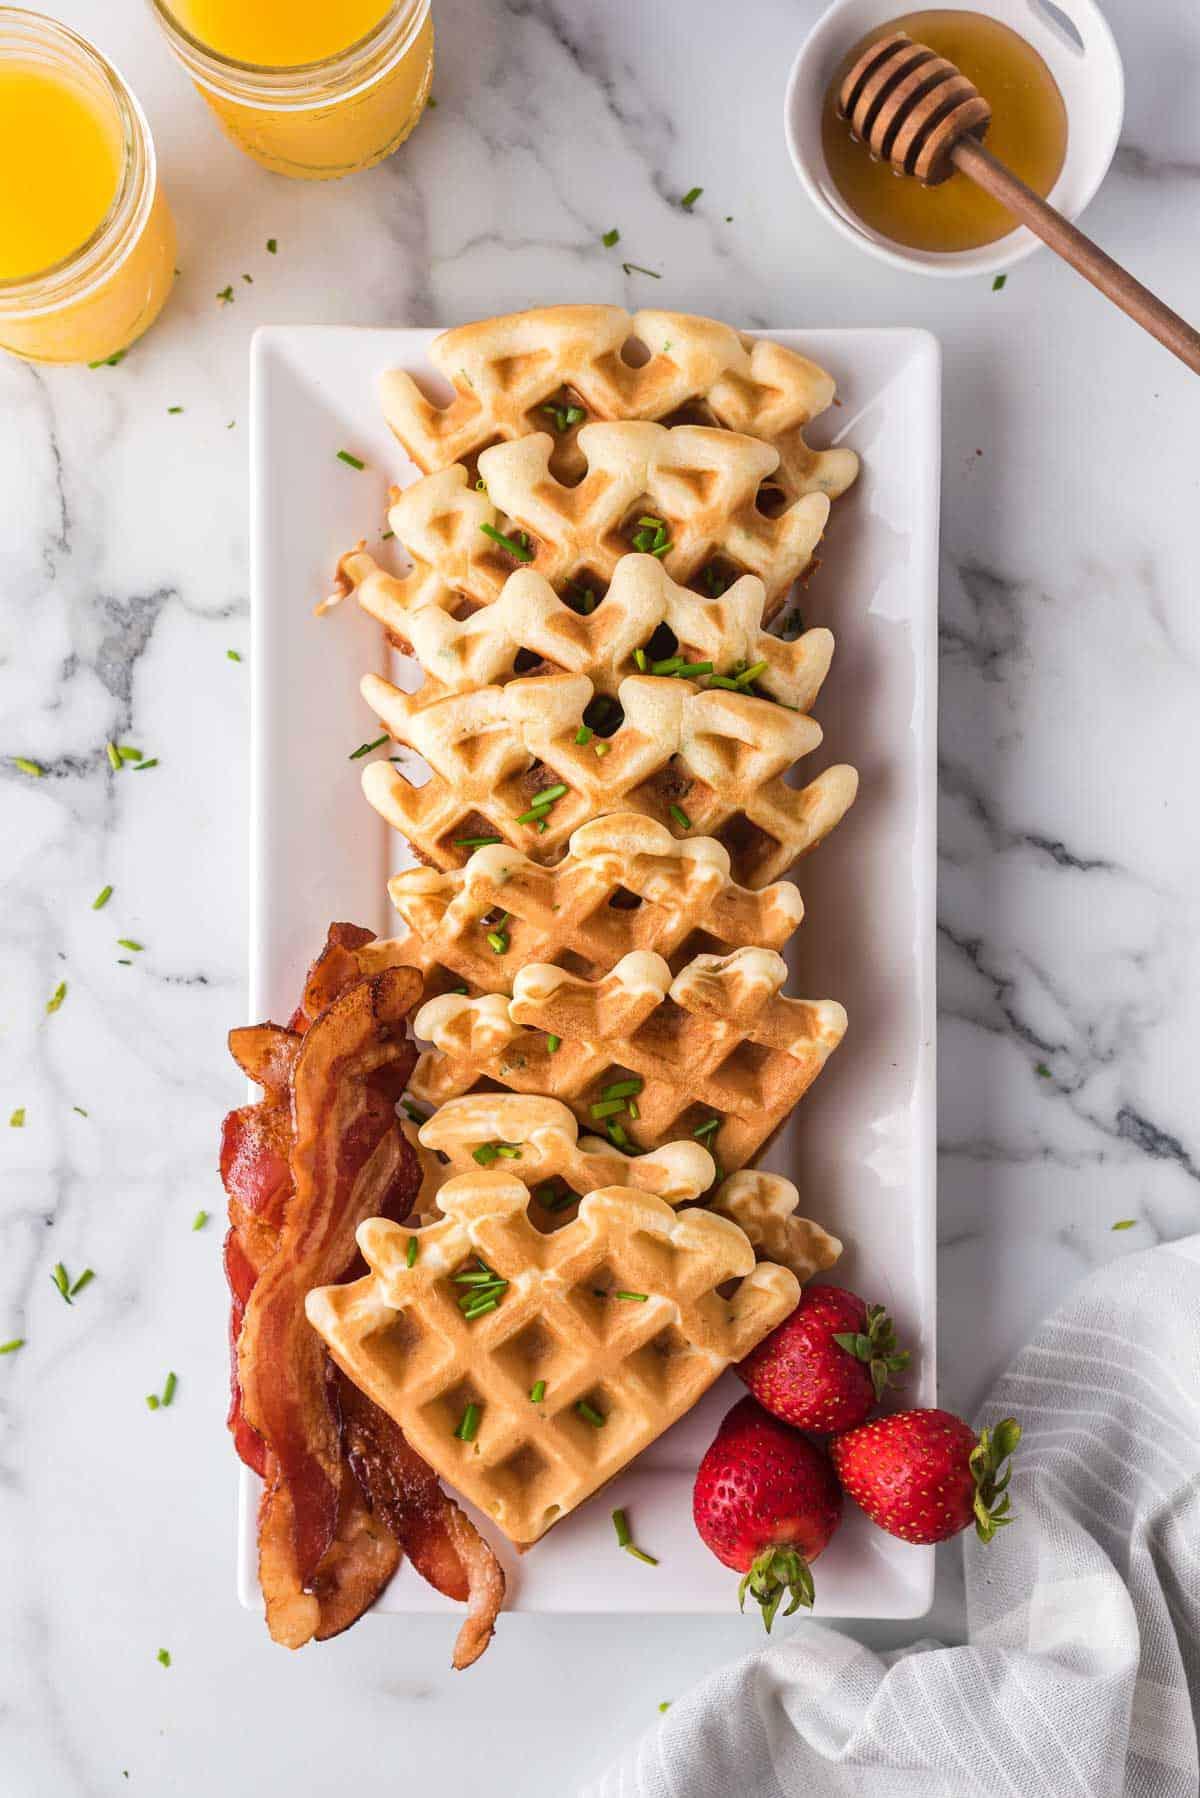 Savory waffles on a tall, thin white platter.